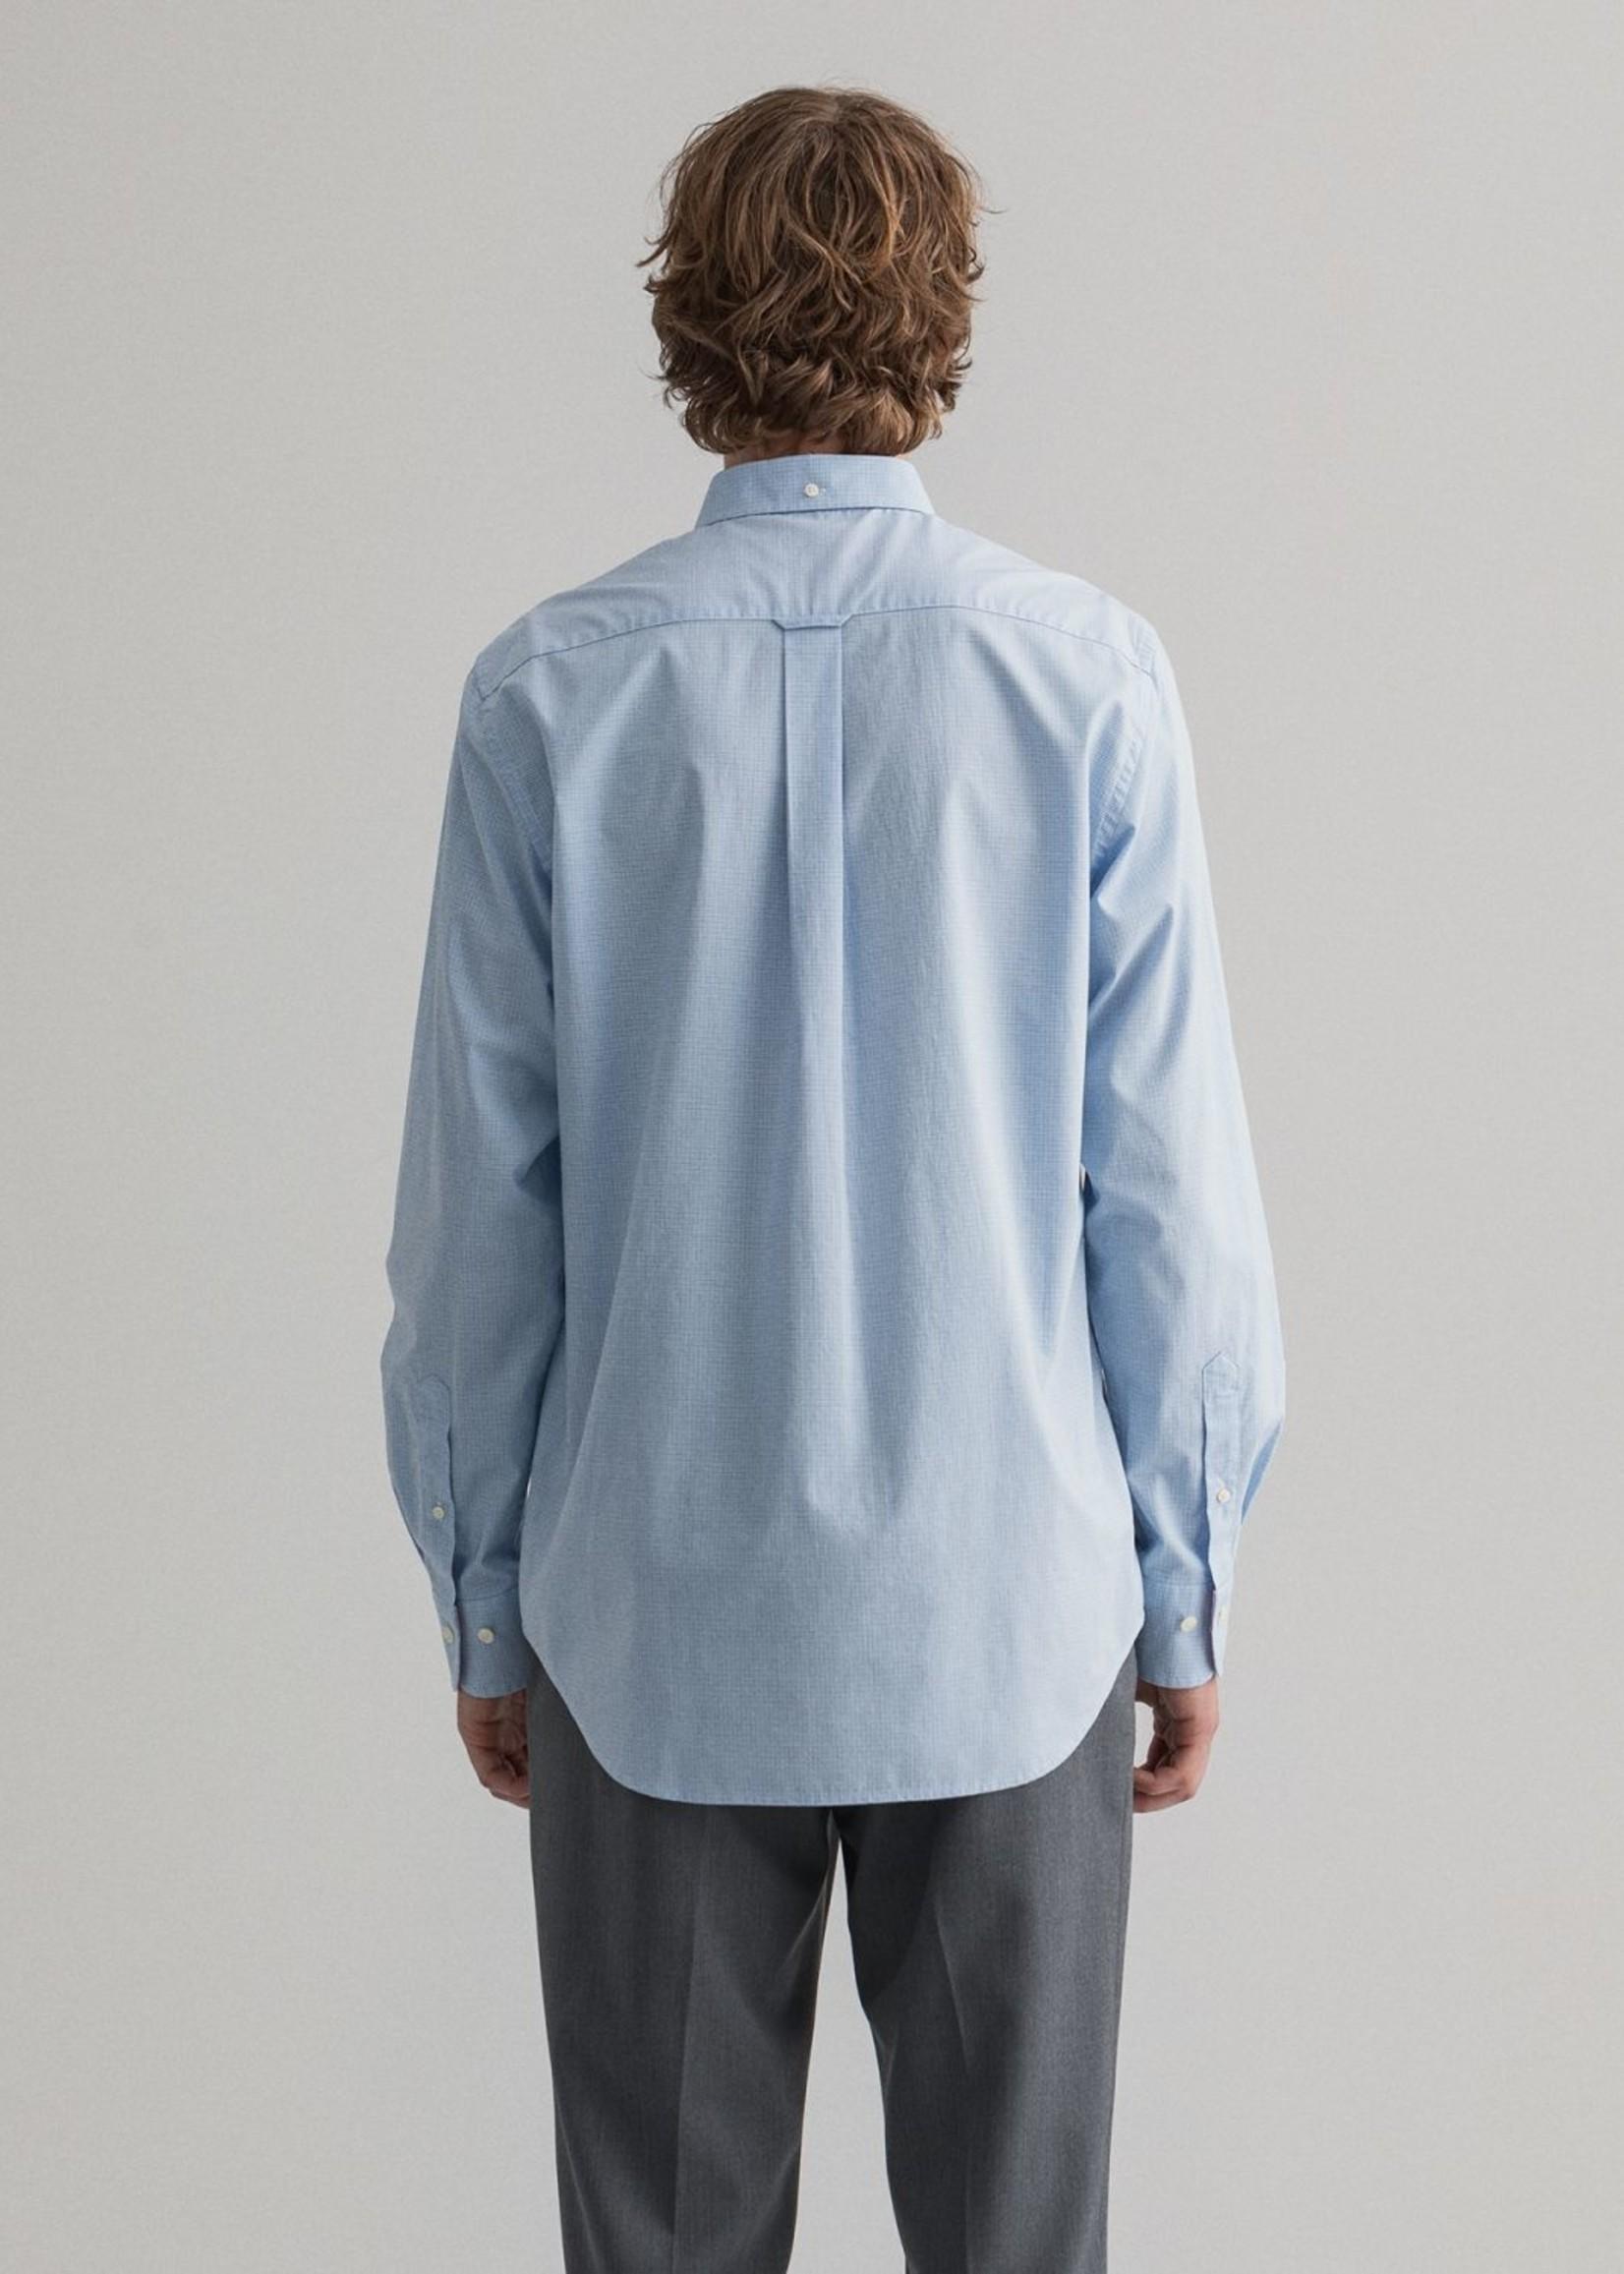 GANT Regular Fit Micro Check Broadcloth Shirt | Light Blue | GANT